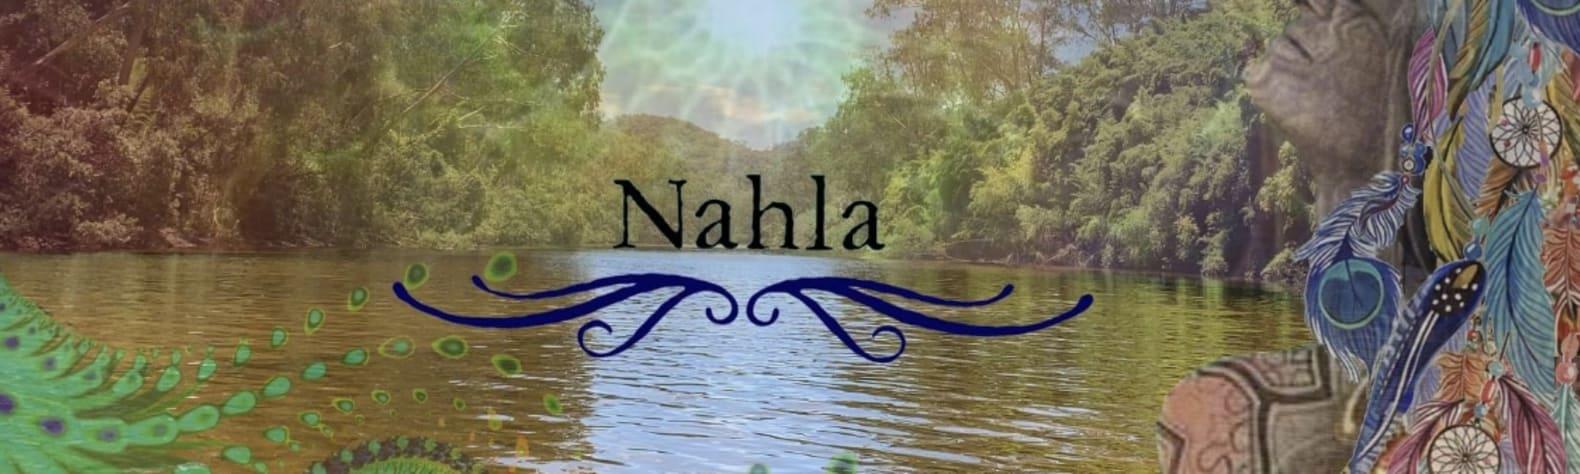 Nahla Colo River Retreat